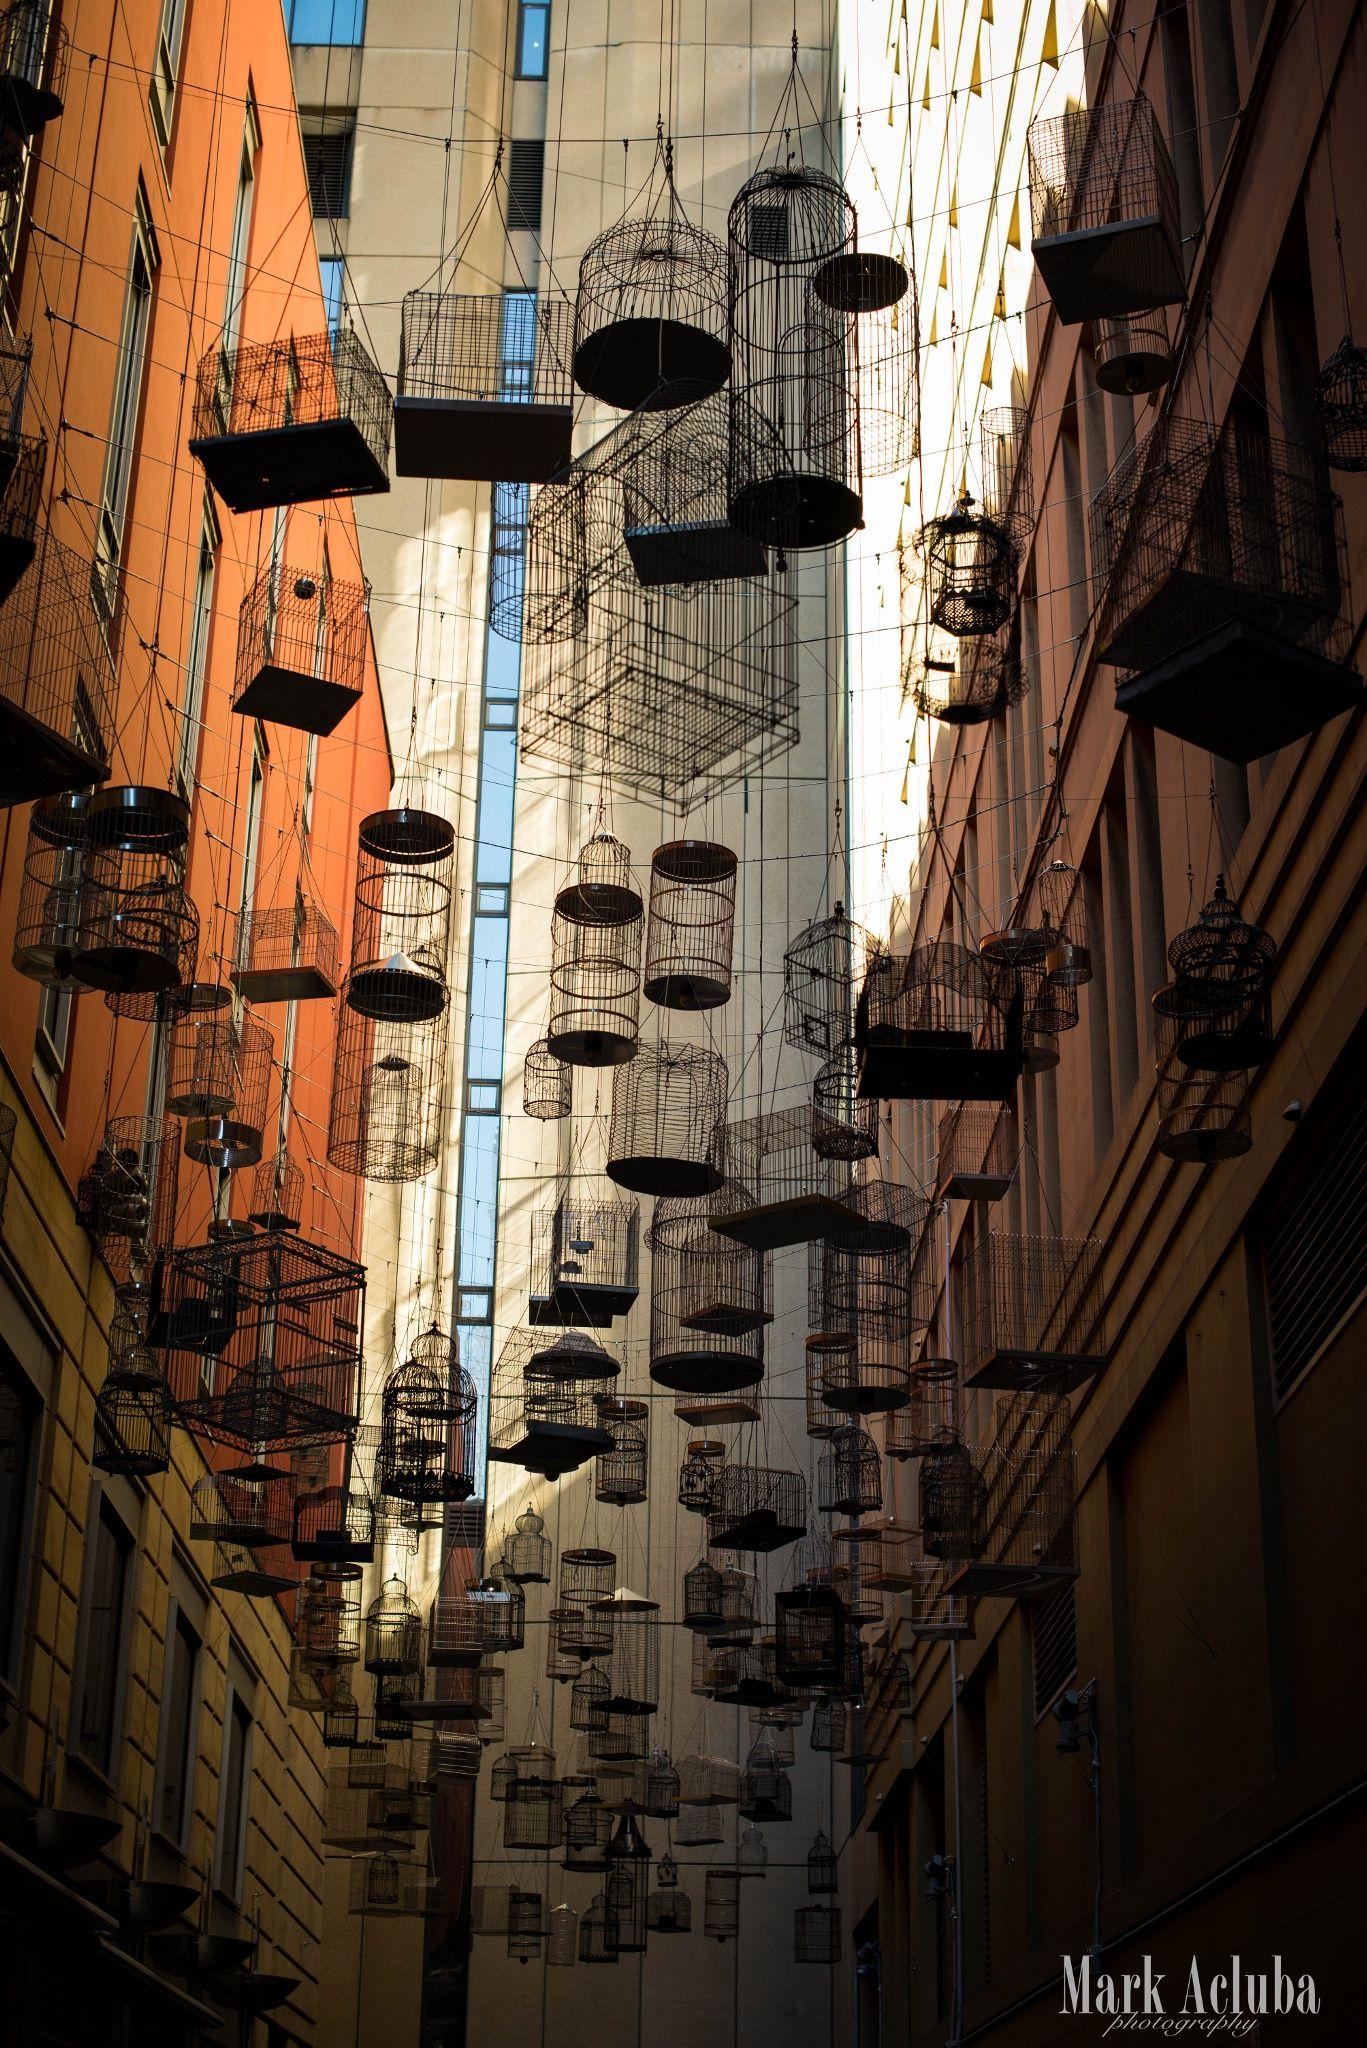 Alley way full of Bird Cages in Sydney, Australia